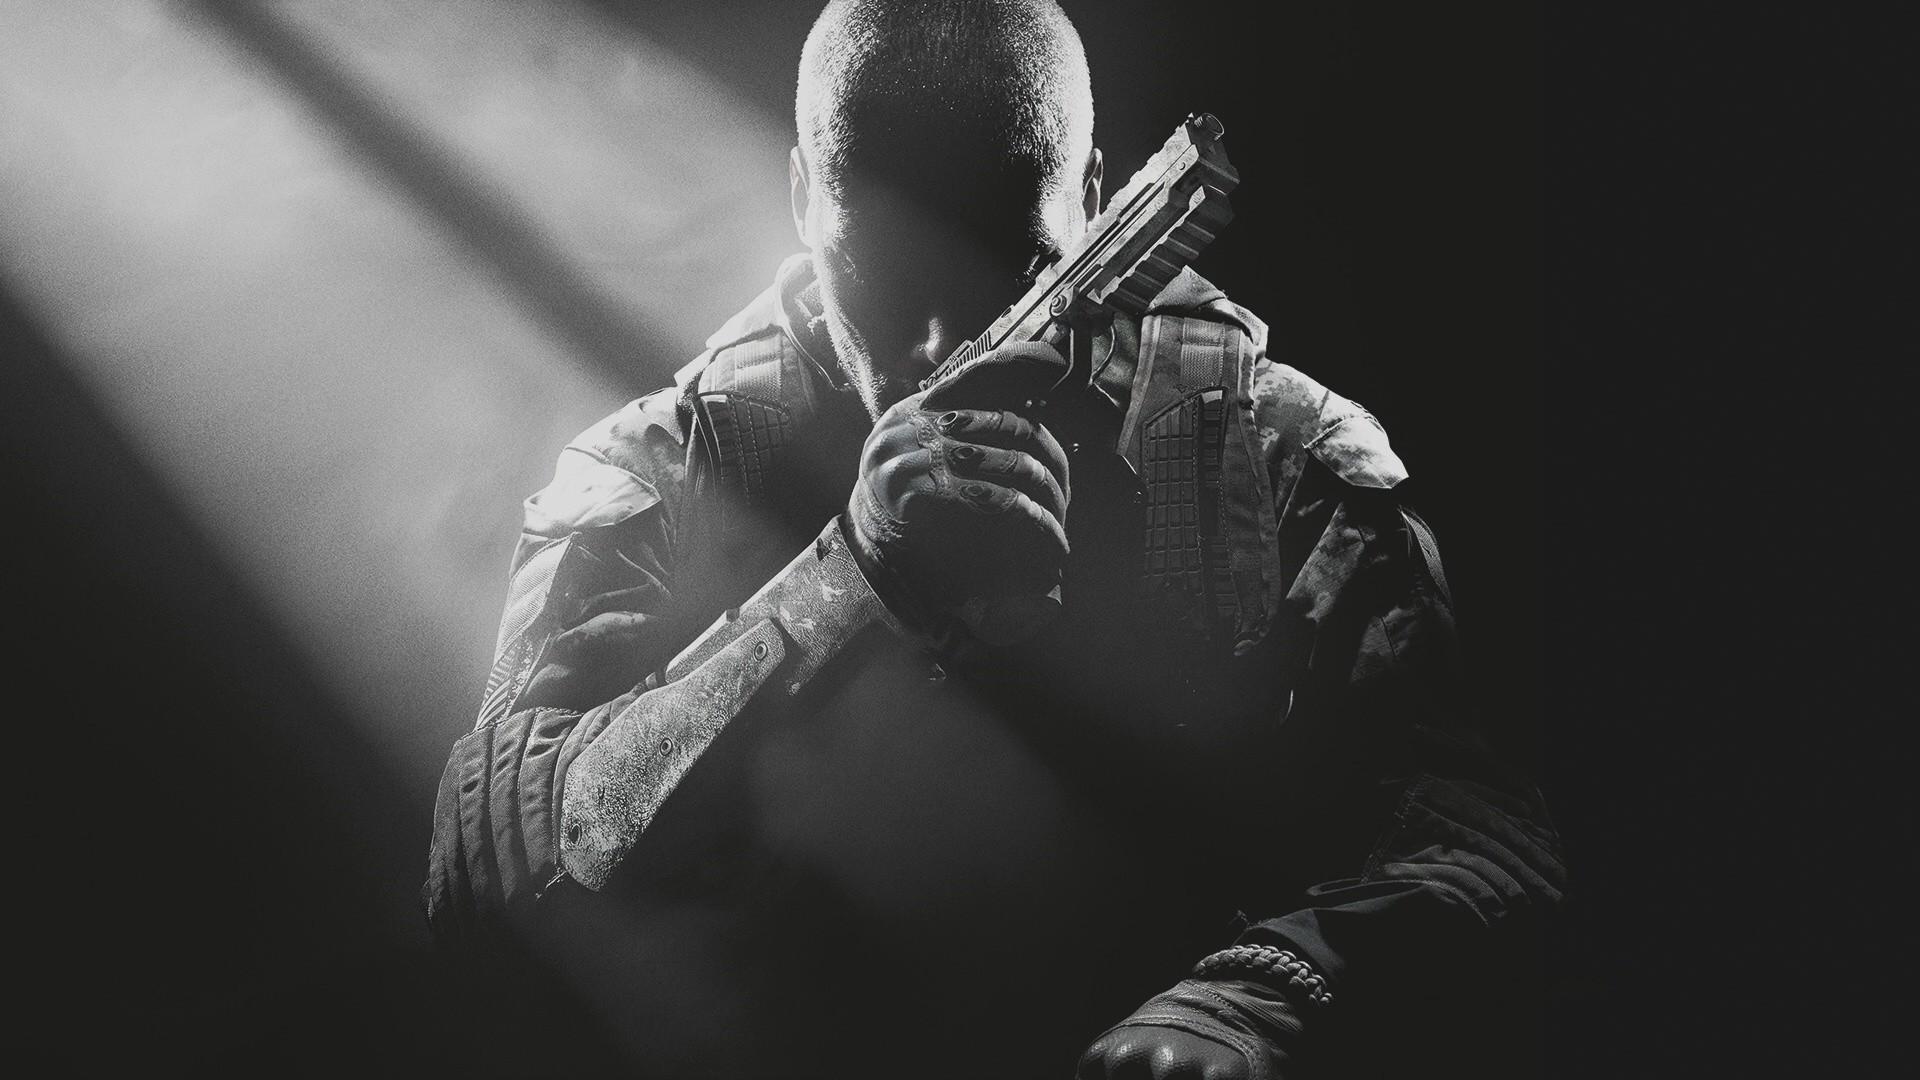 Call of Duty Black Ops II HD desktop wallpaper Widescreen High 1920×1080